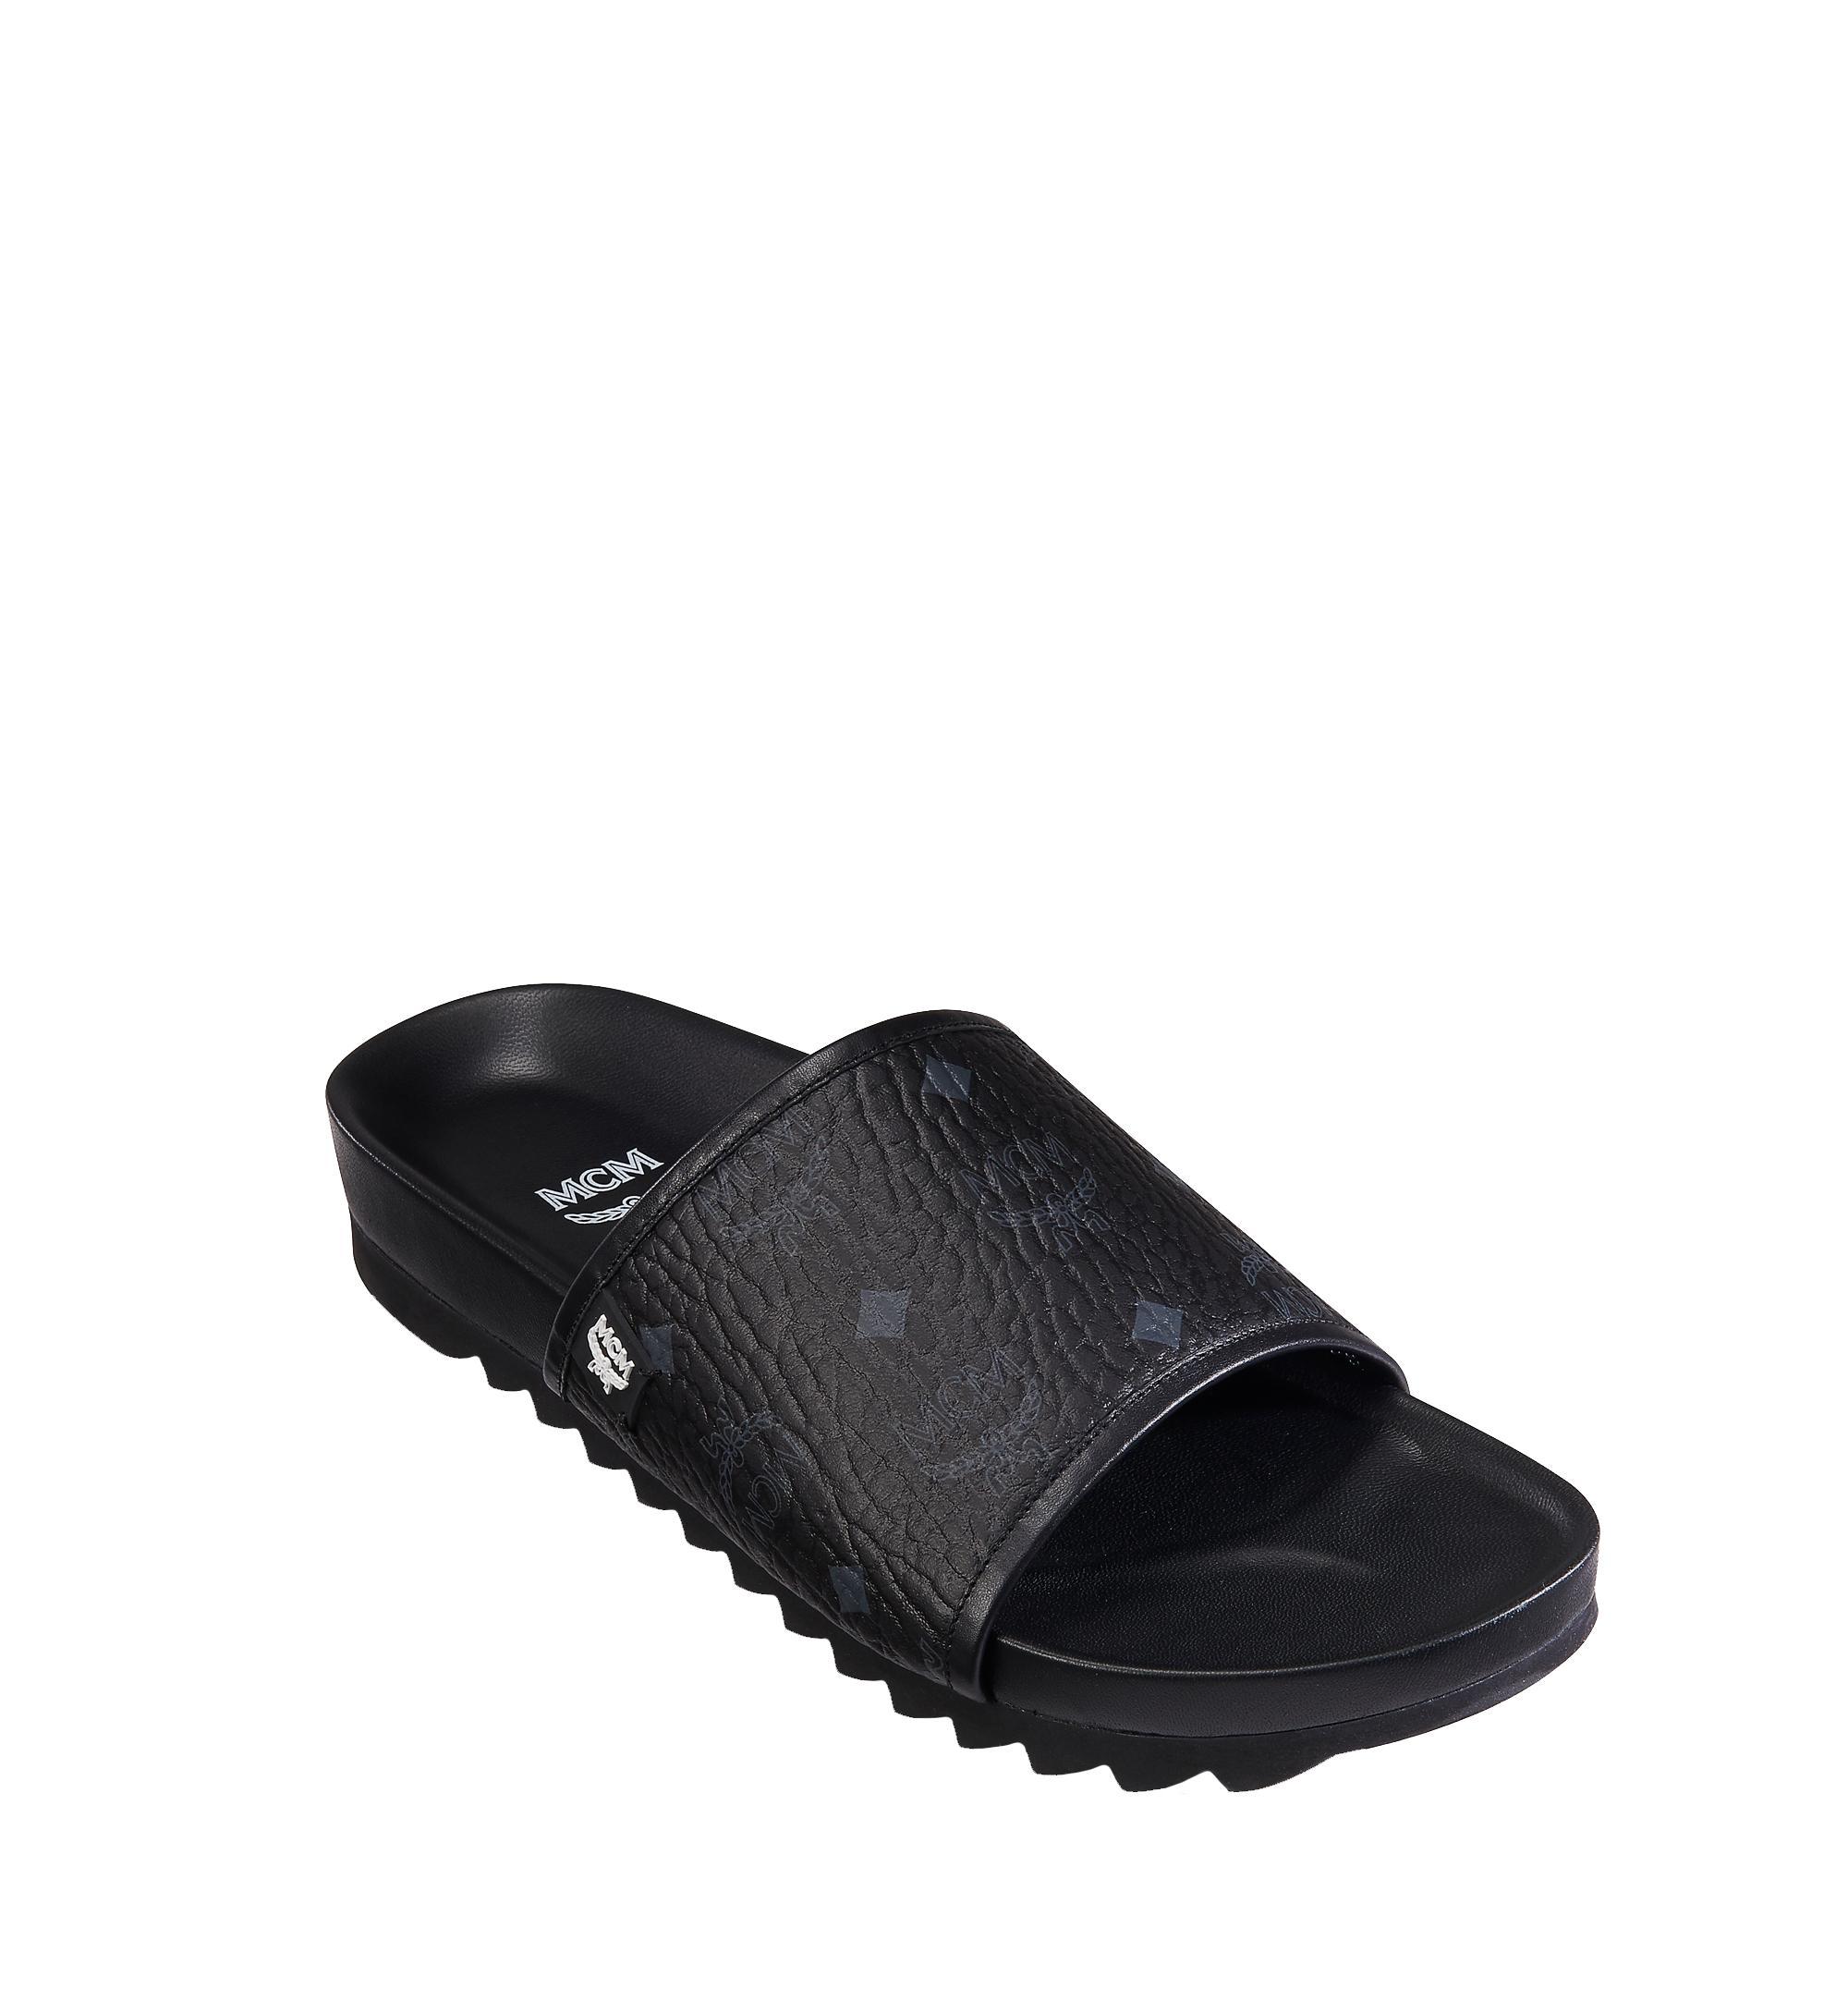 5ab2c371ba62 MCM - Black Slides In Visetos for Men - Lyst. View fullscreen